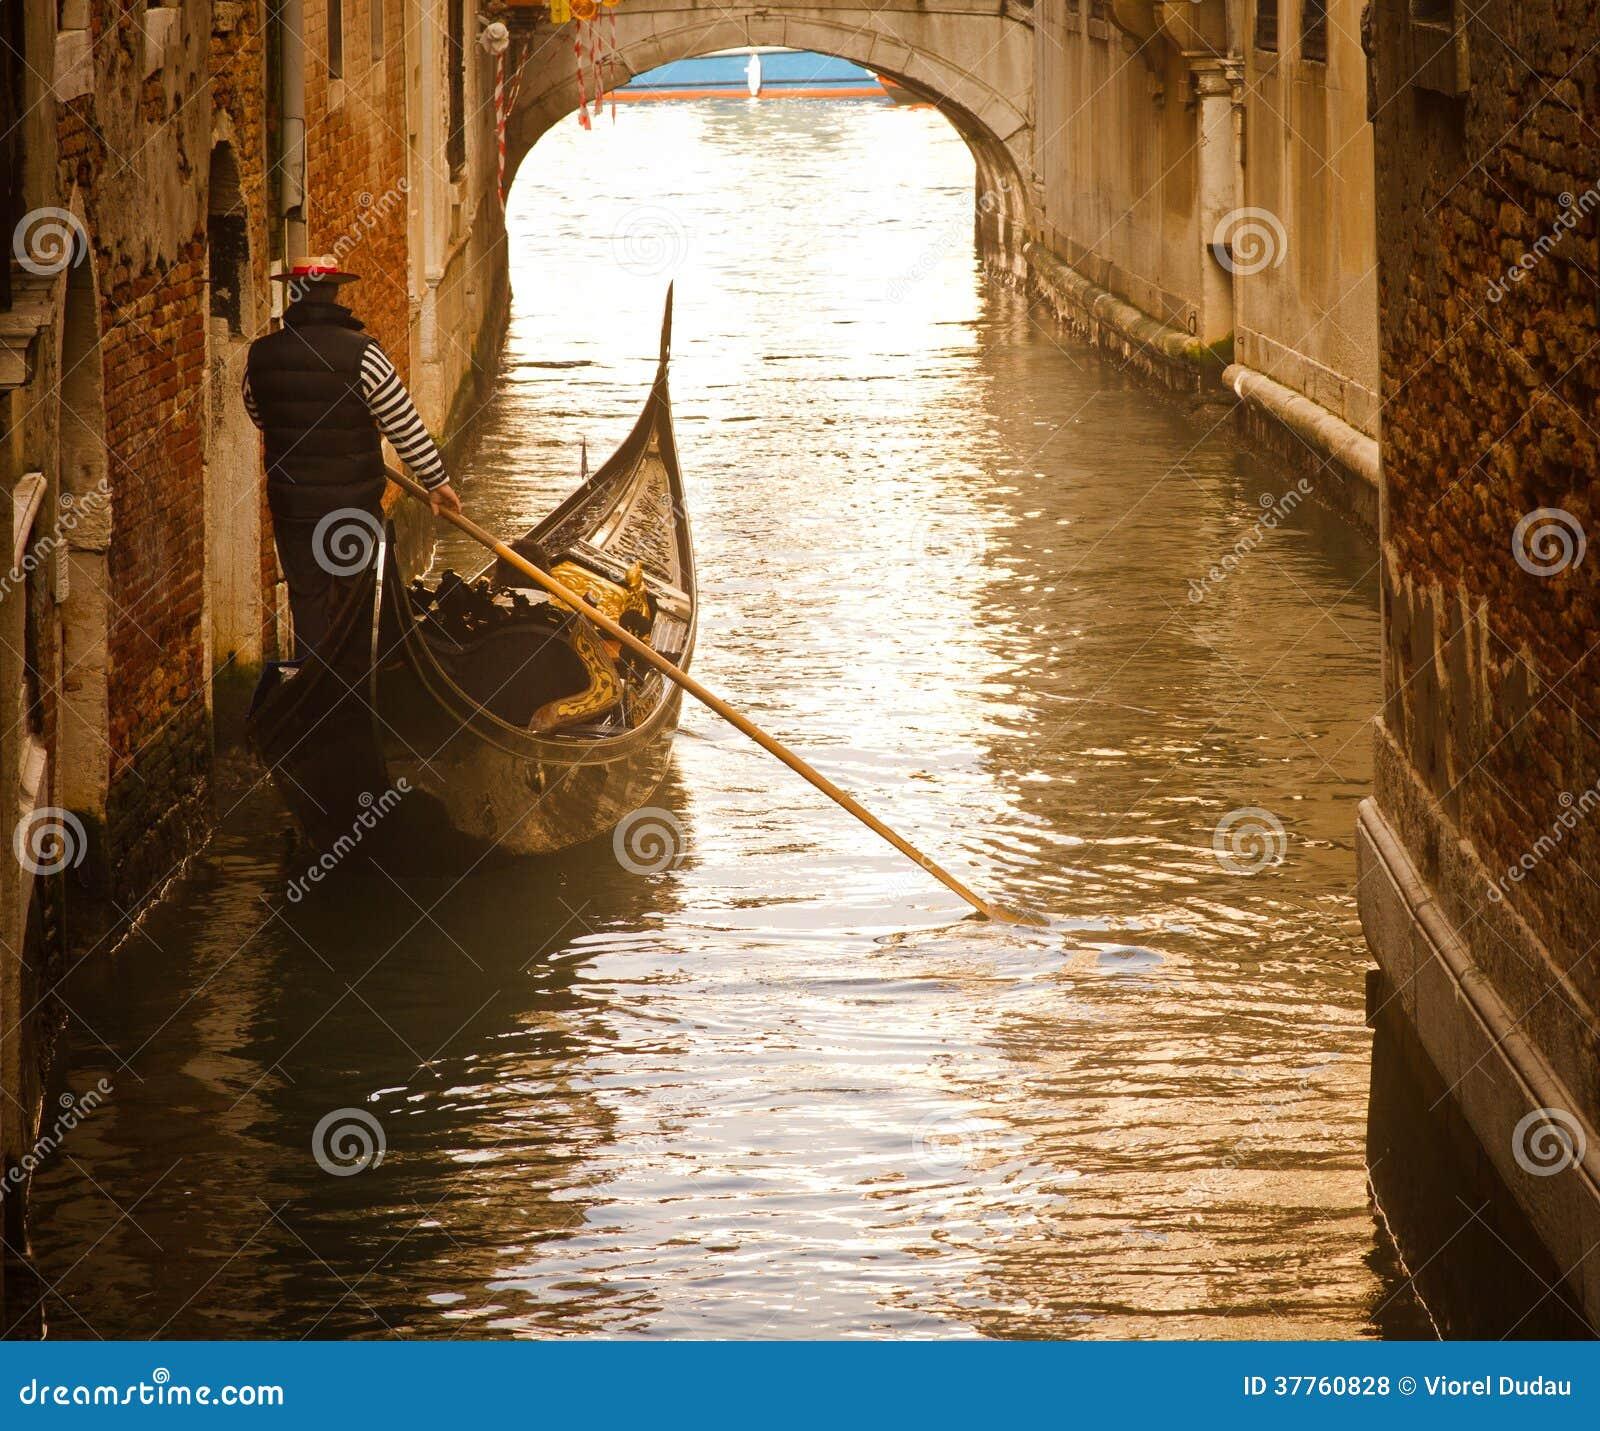 Venice gondolier in sunset